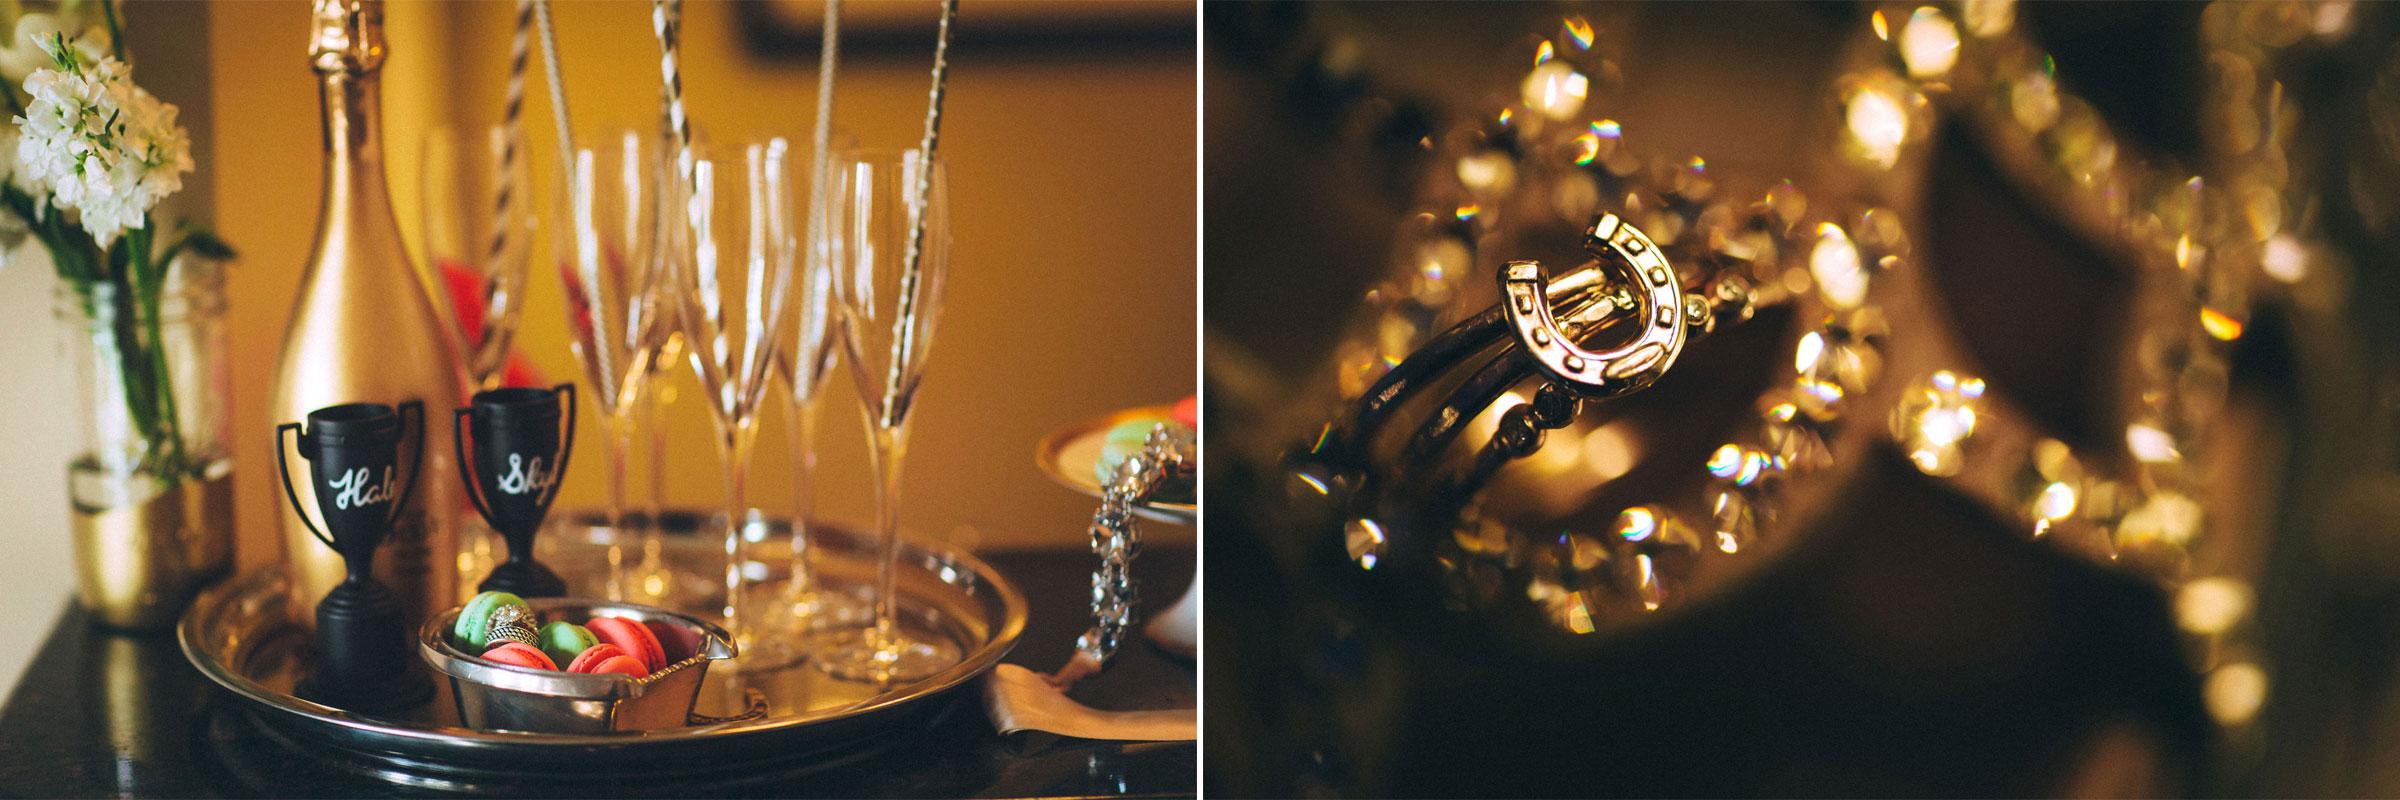 Gold Horseshoe Ring for Something New, Sergio Rossi Mermaid Swarovski Crystal Booties, Black Tie Wedding, Nashville Wedding, Southern Wedding, Glam Wedding